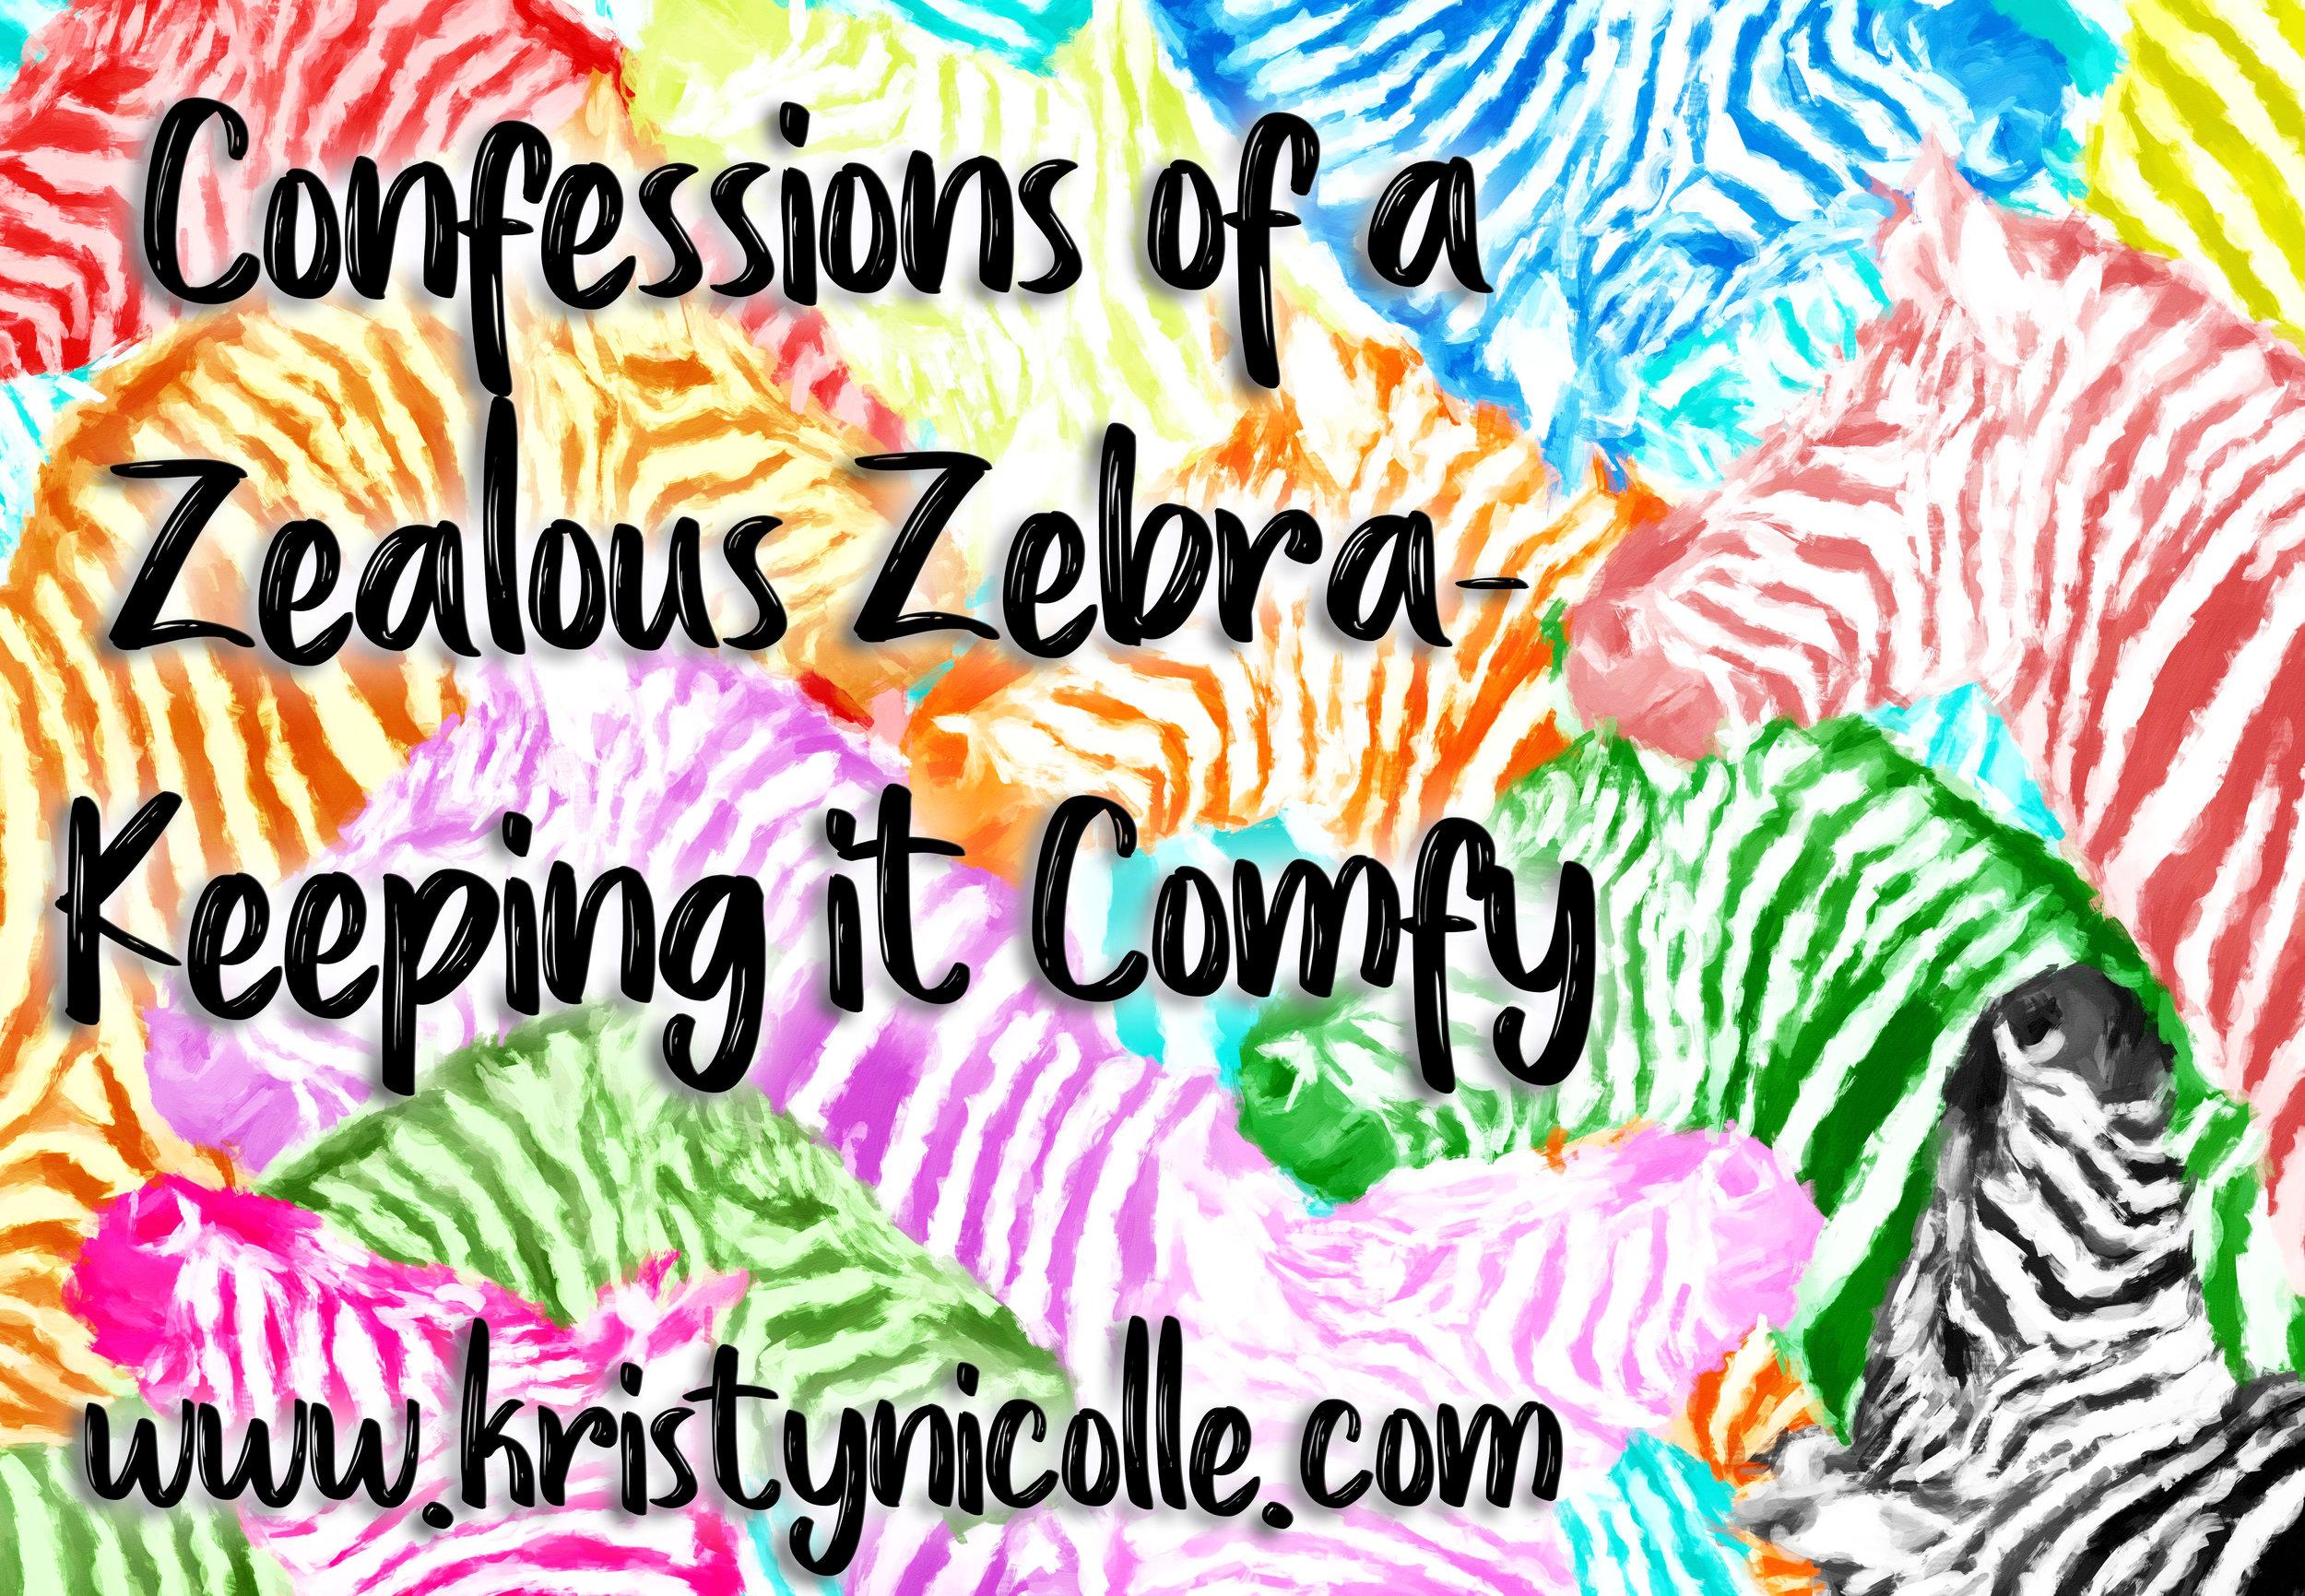 confessions of a zealous zebra keeping it comfy